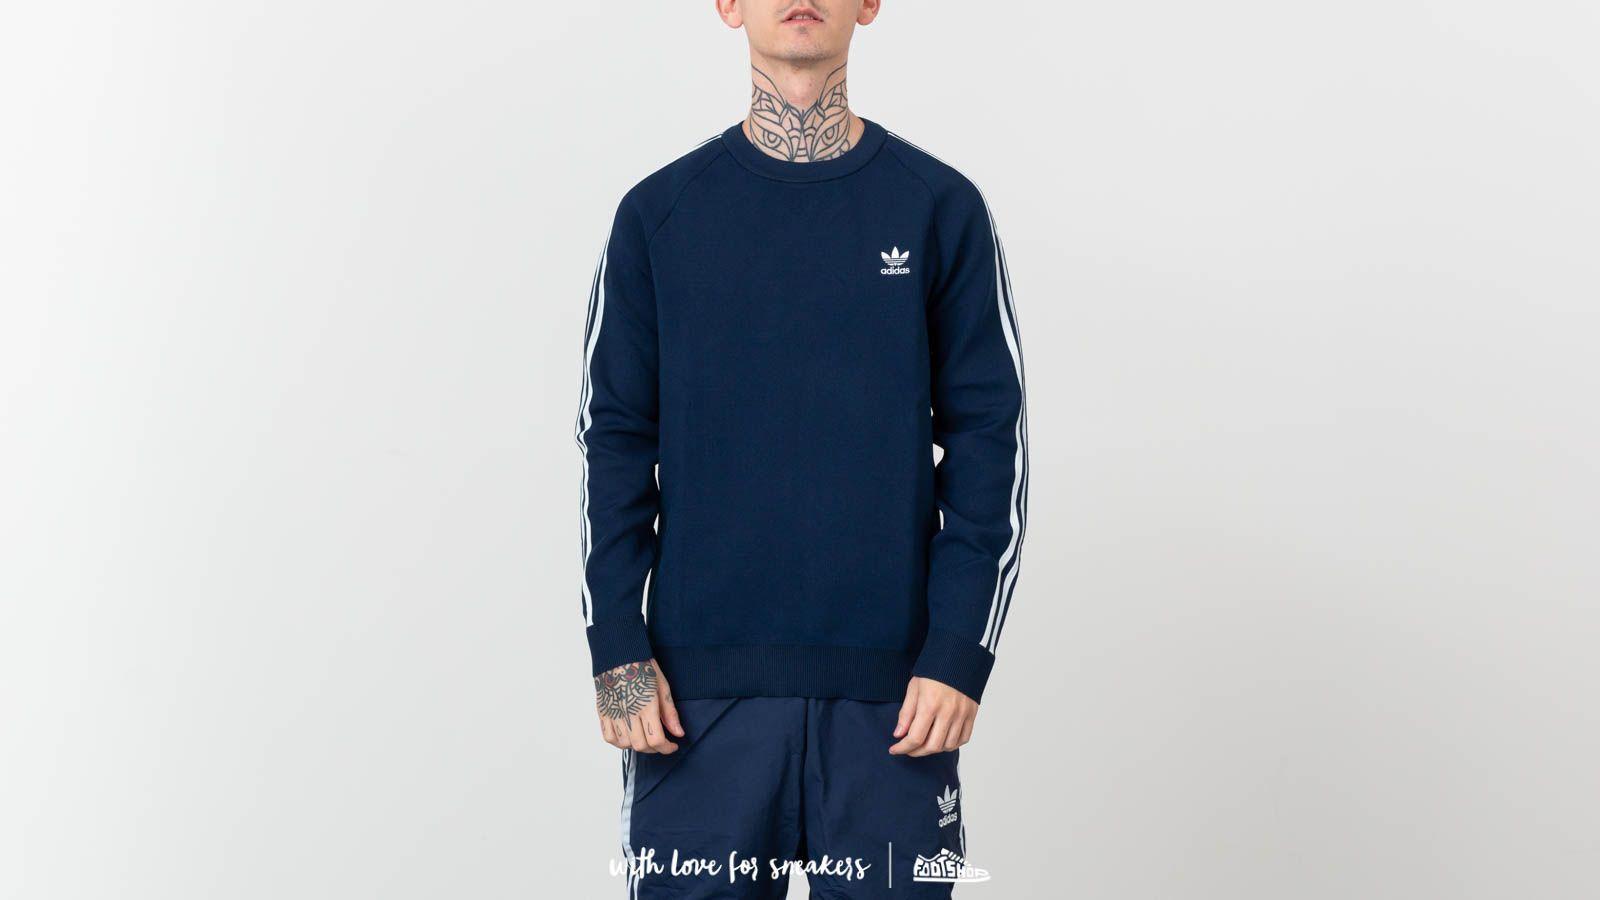 adidas Originals Knit Crewneck